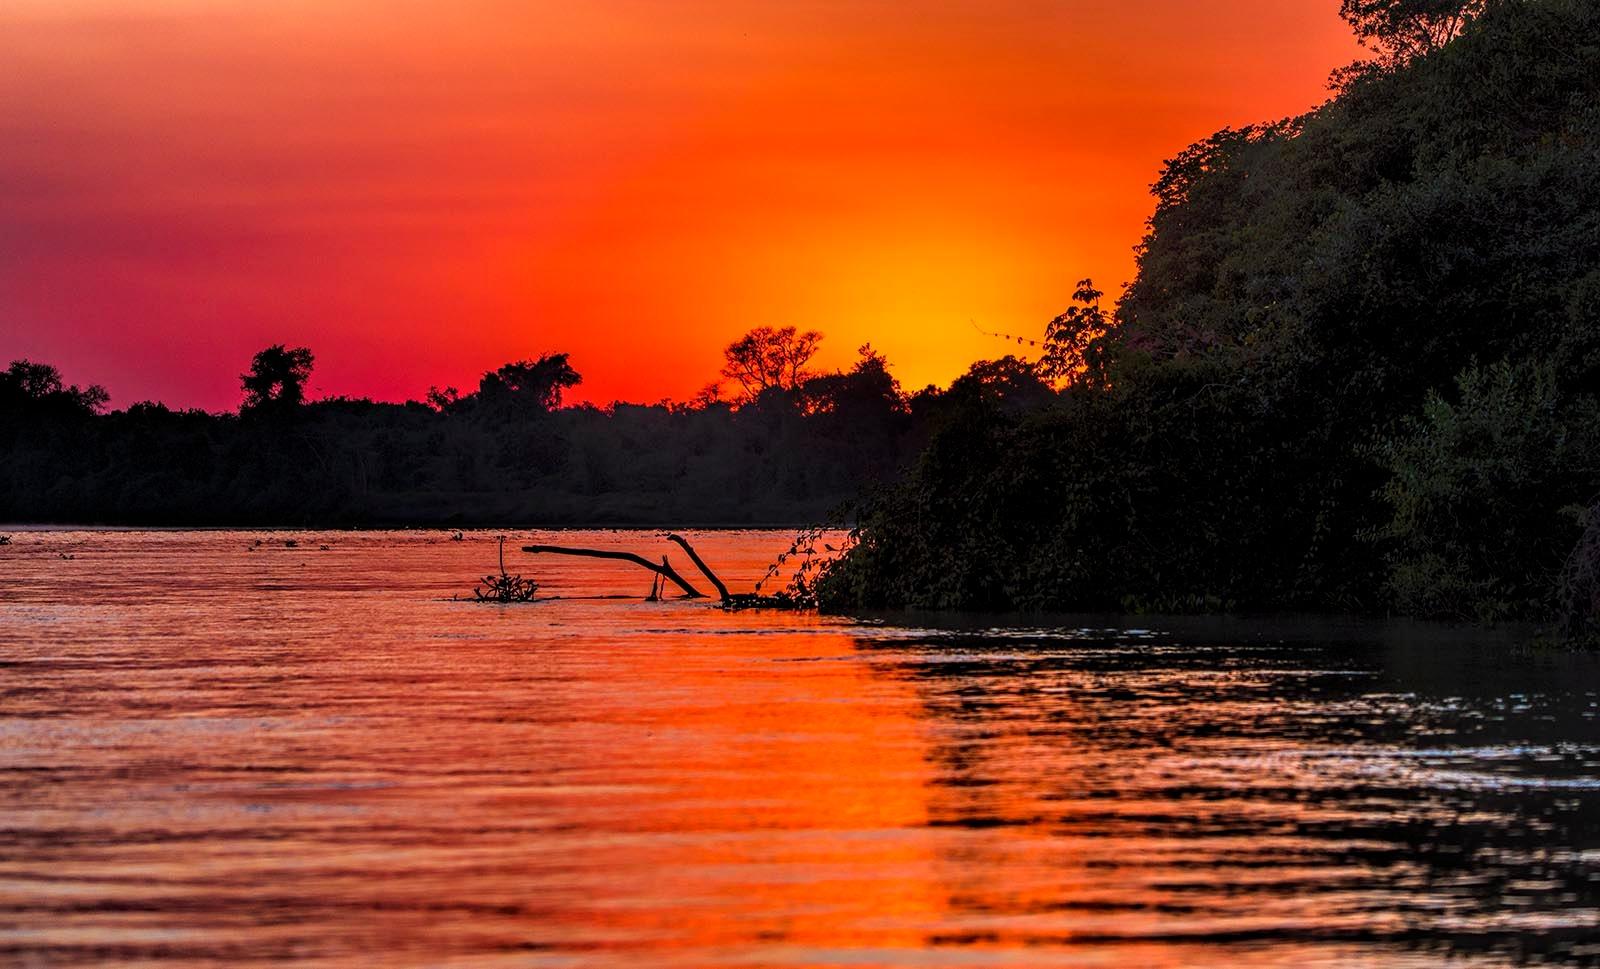 Sunrise in the Pantanal